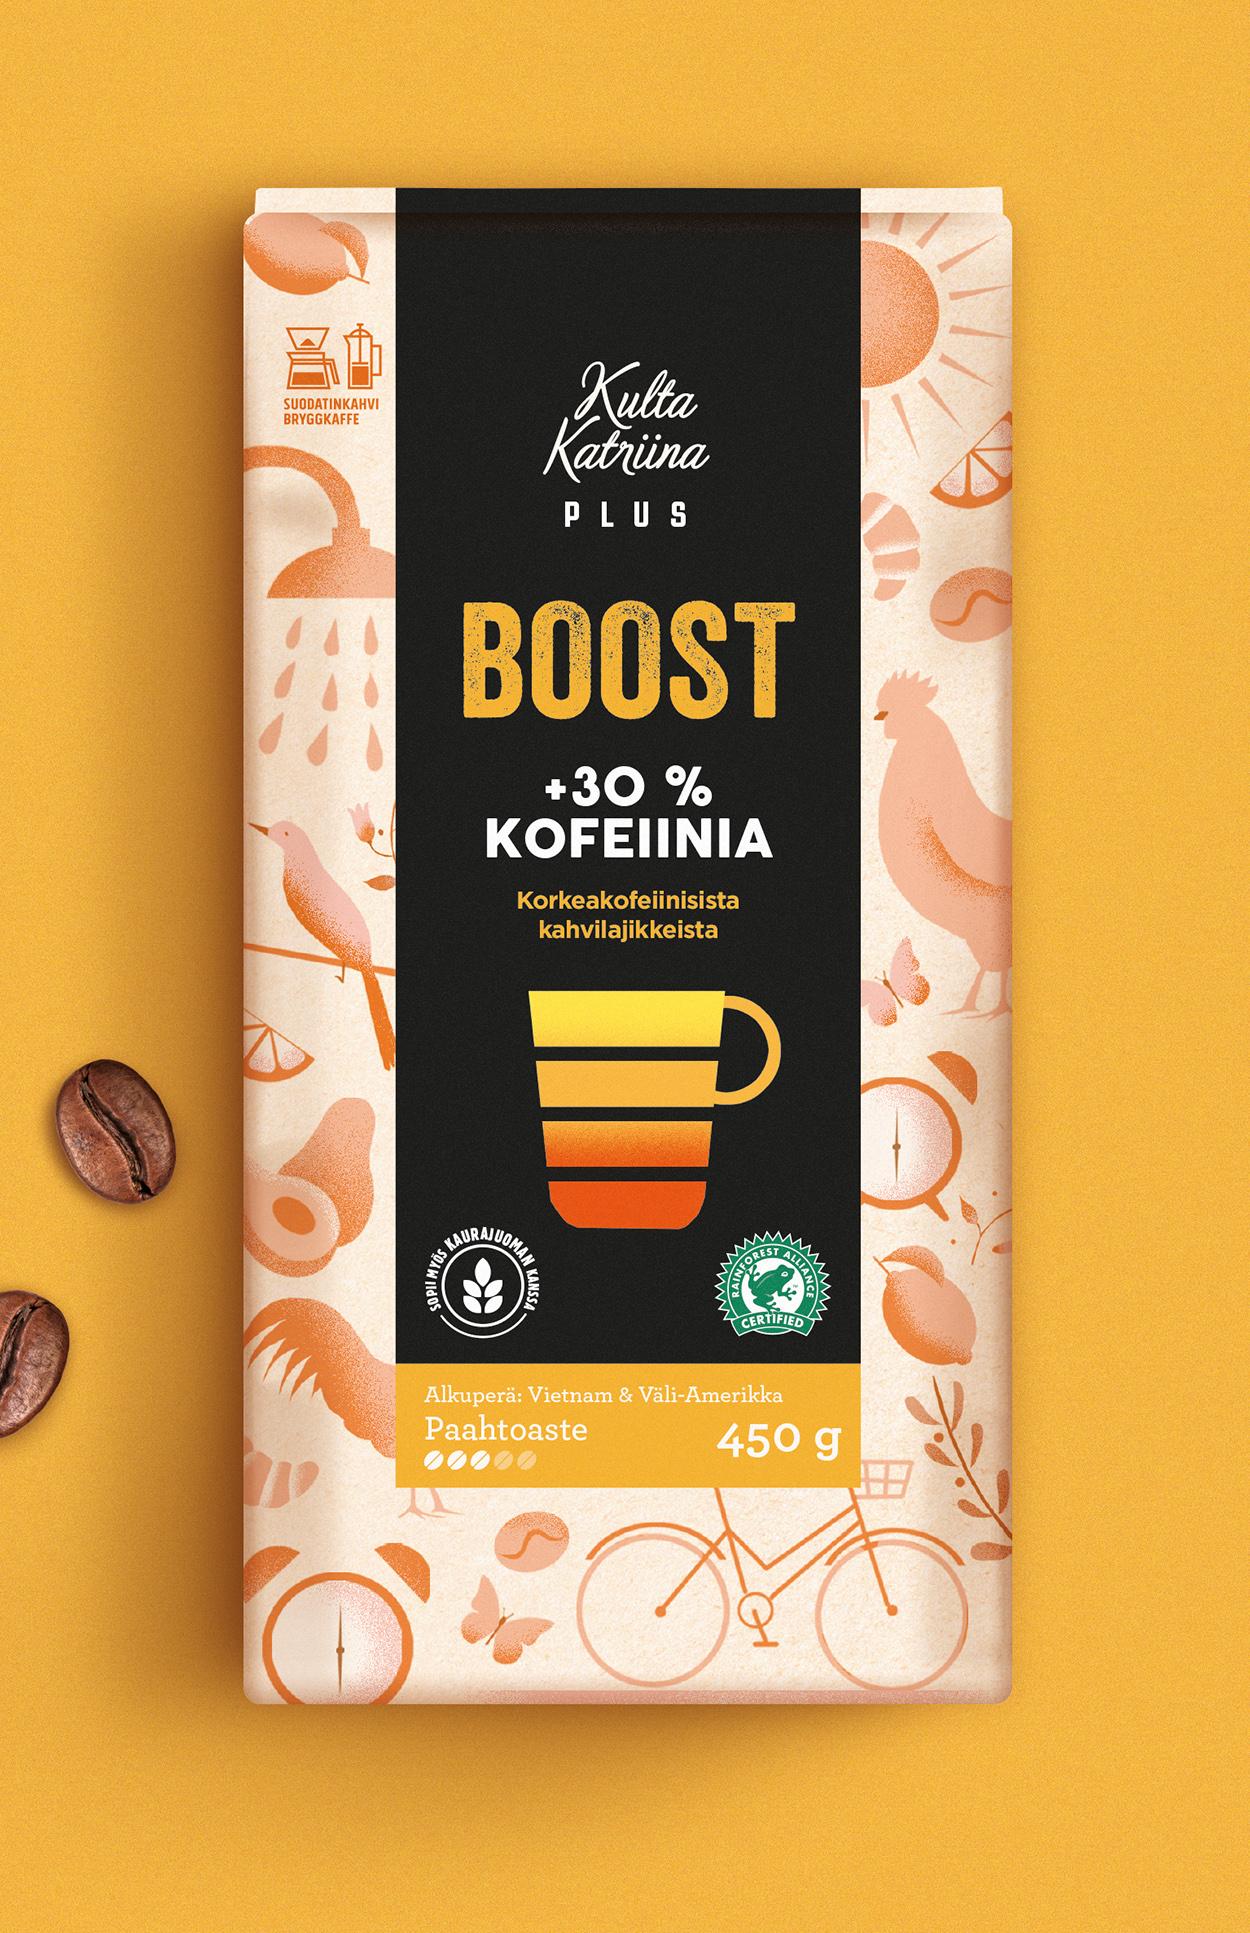 New Kulta Katriina Plus Packaging Design